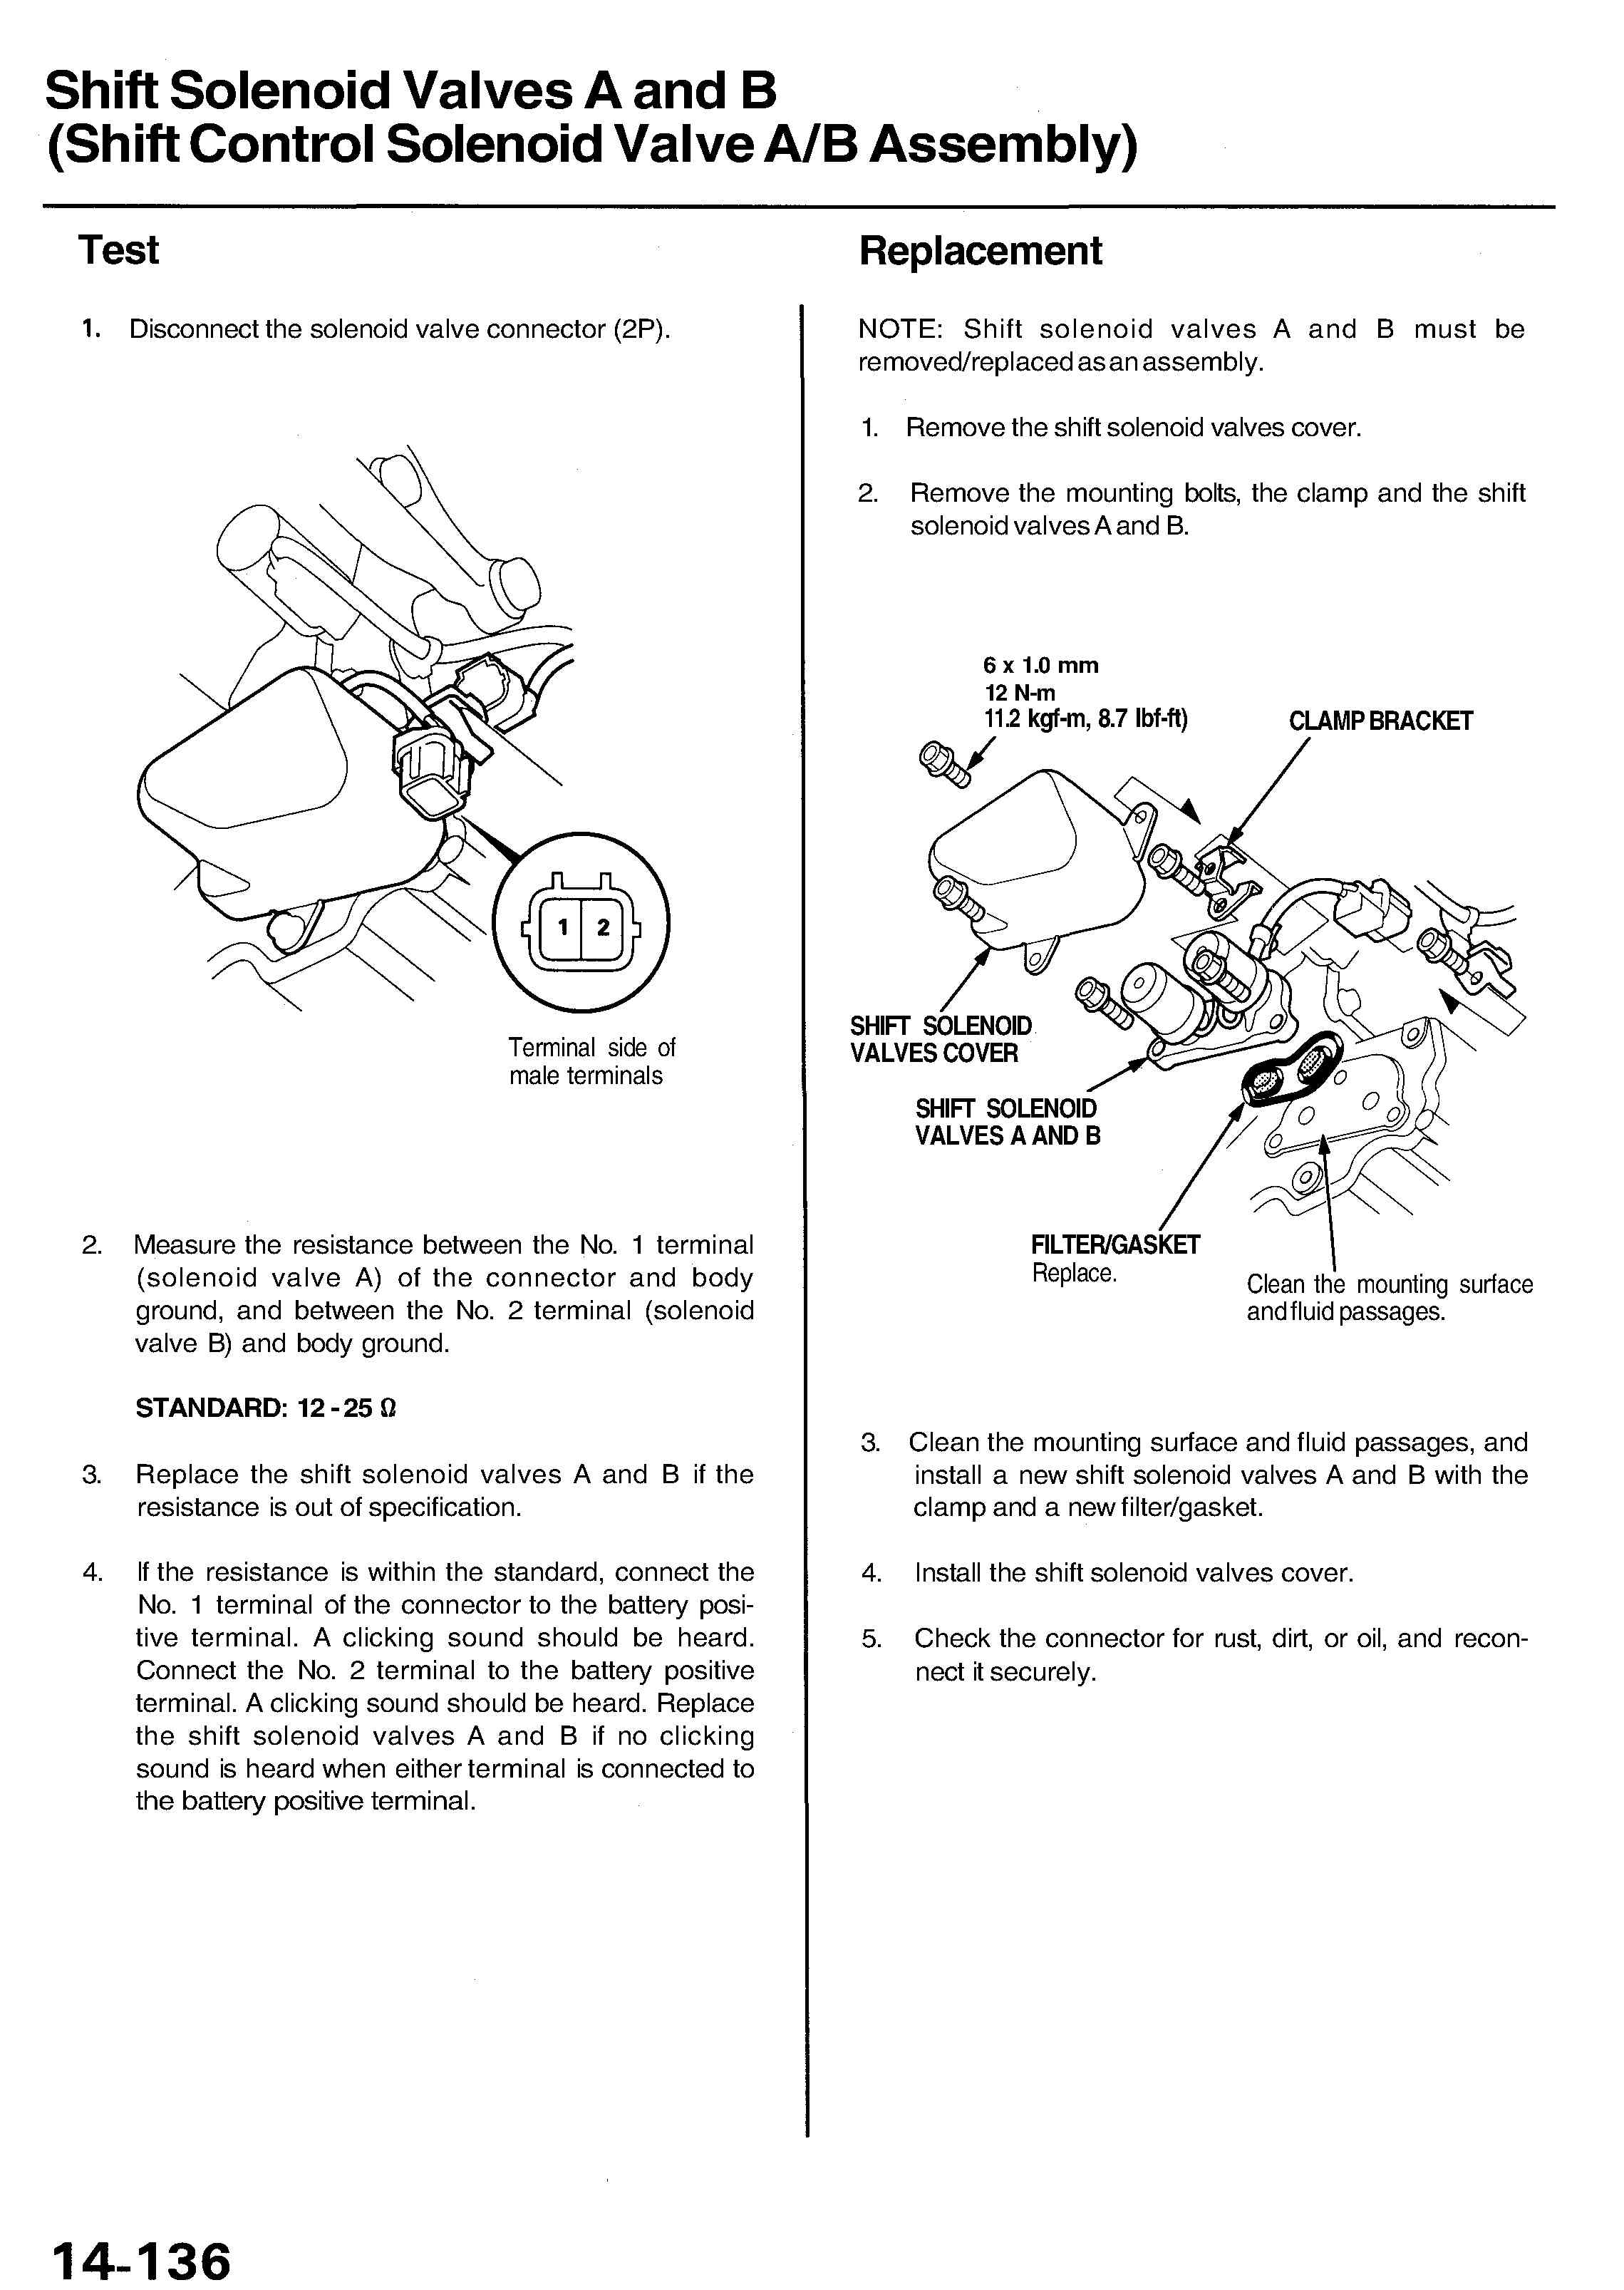 lexus transmission diagram  lexus  free engine image for